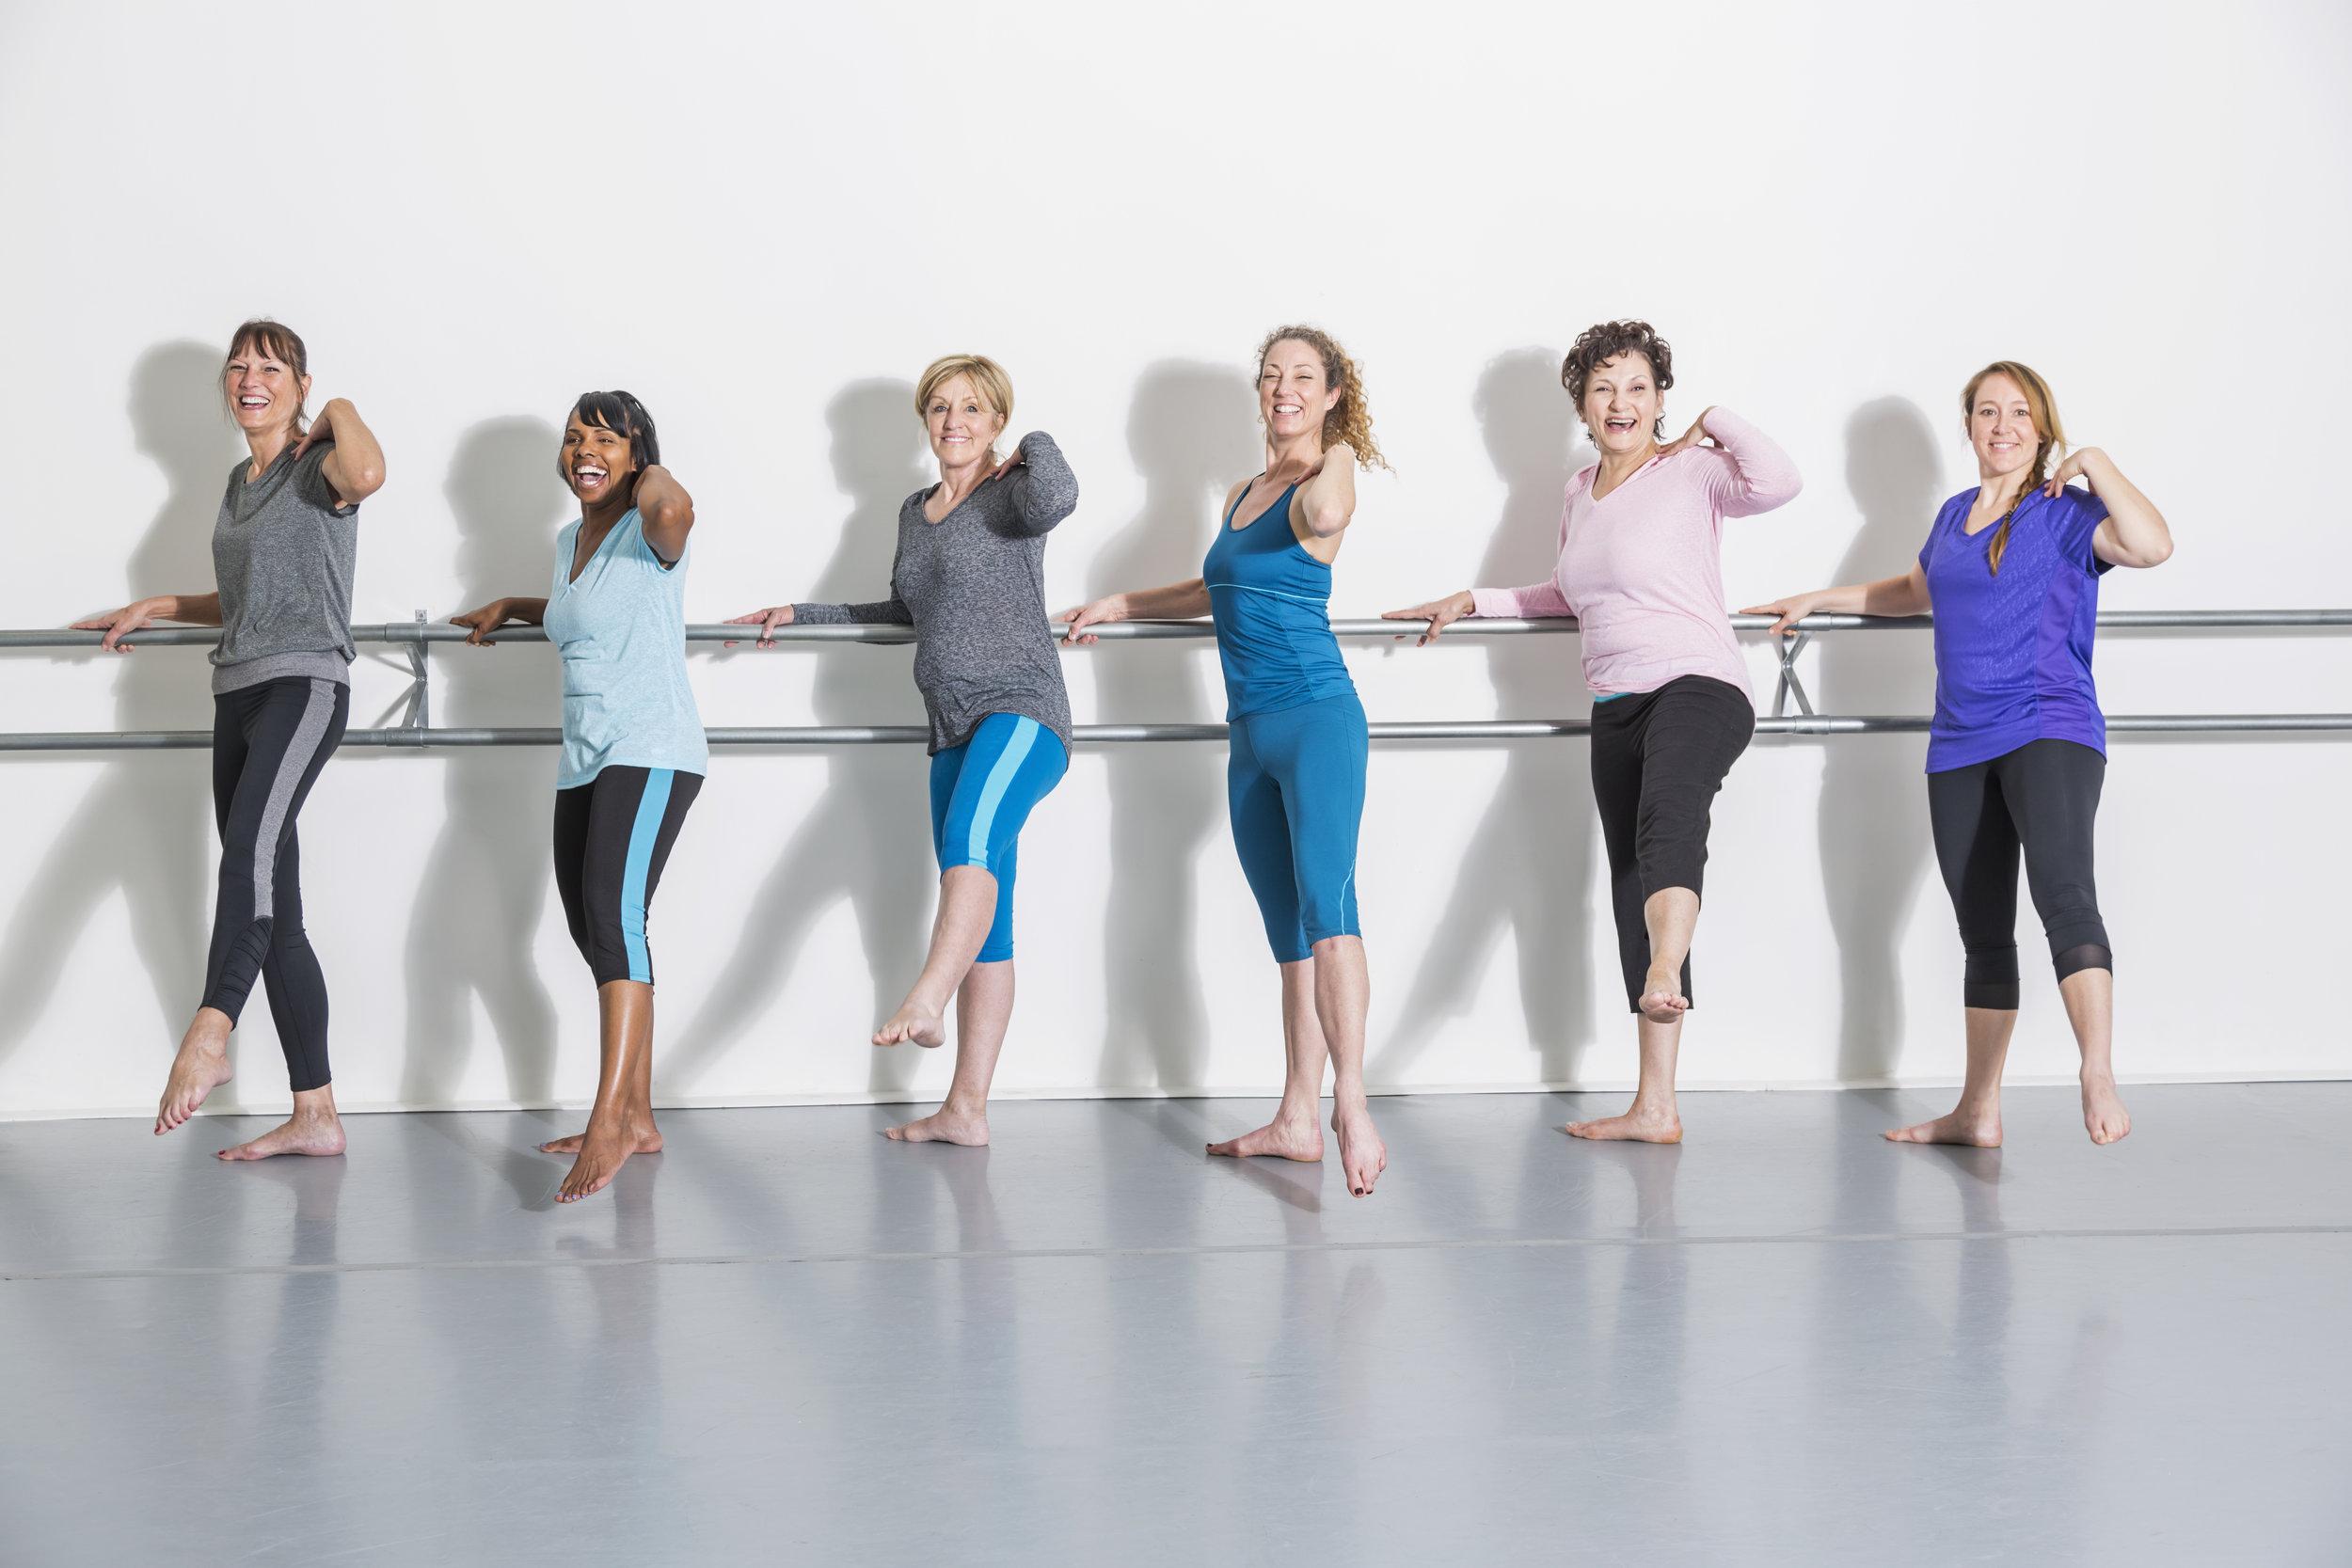 Women-doing-barre-exercises-509680897_5760x3840.jpeg